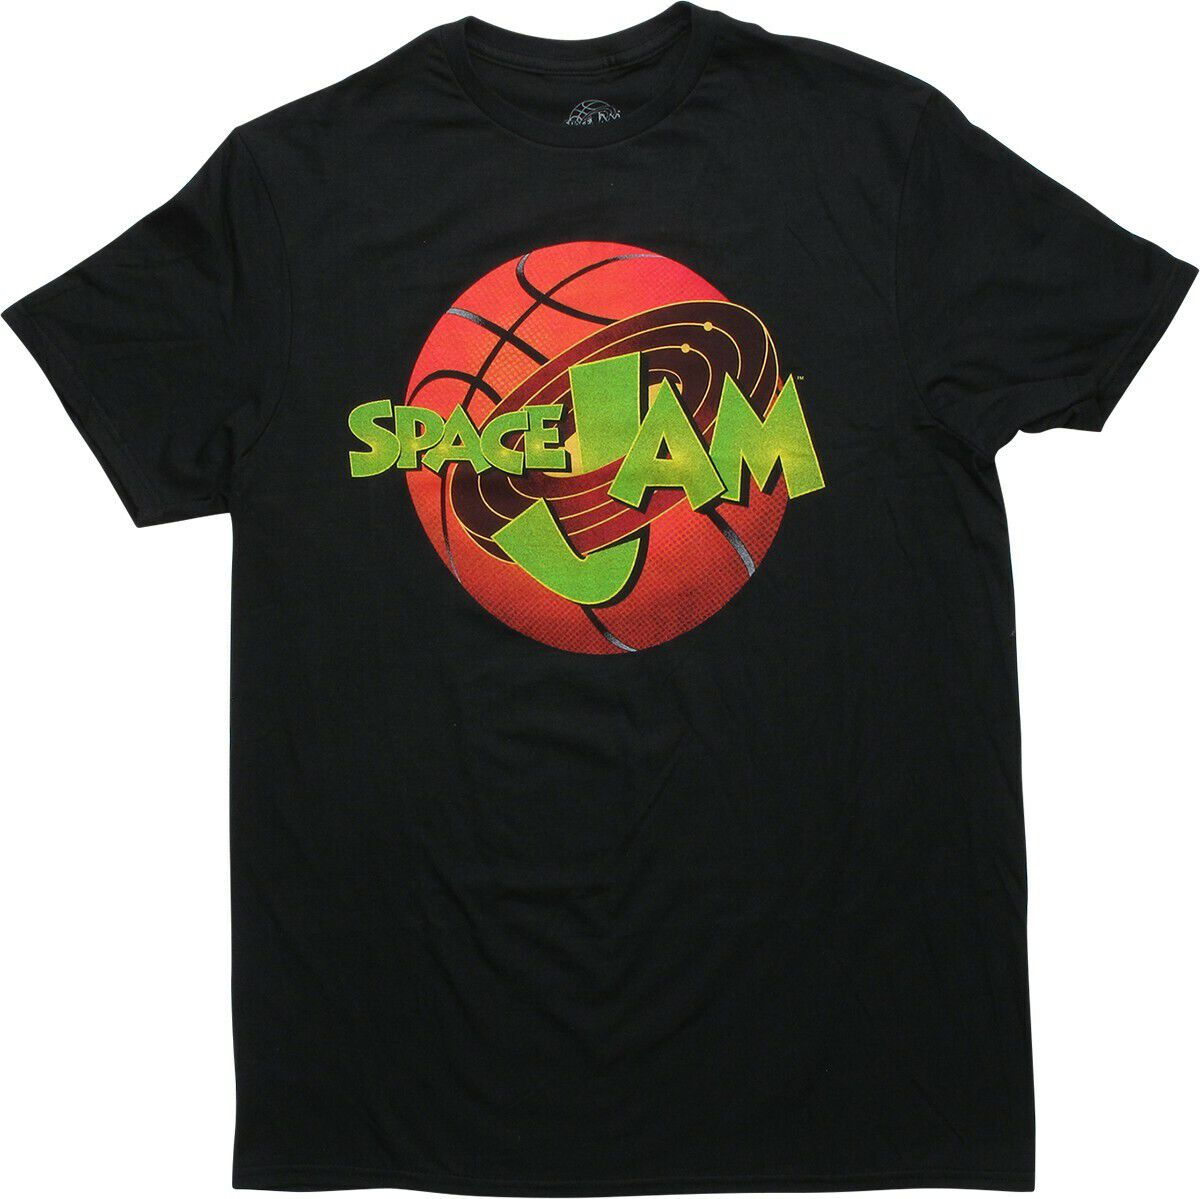 Space Jam Logo Black T-Shirt